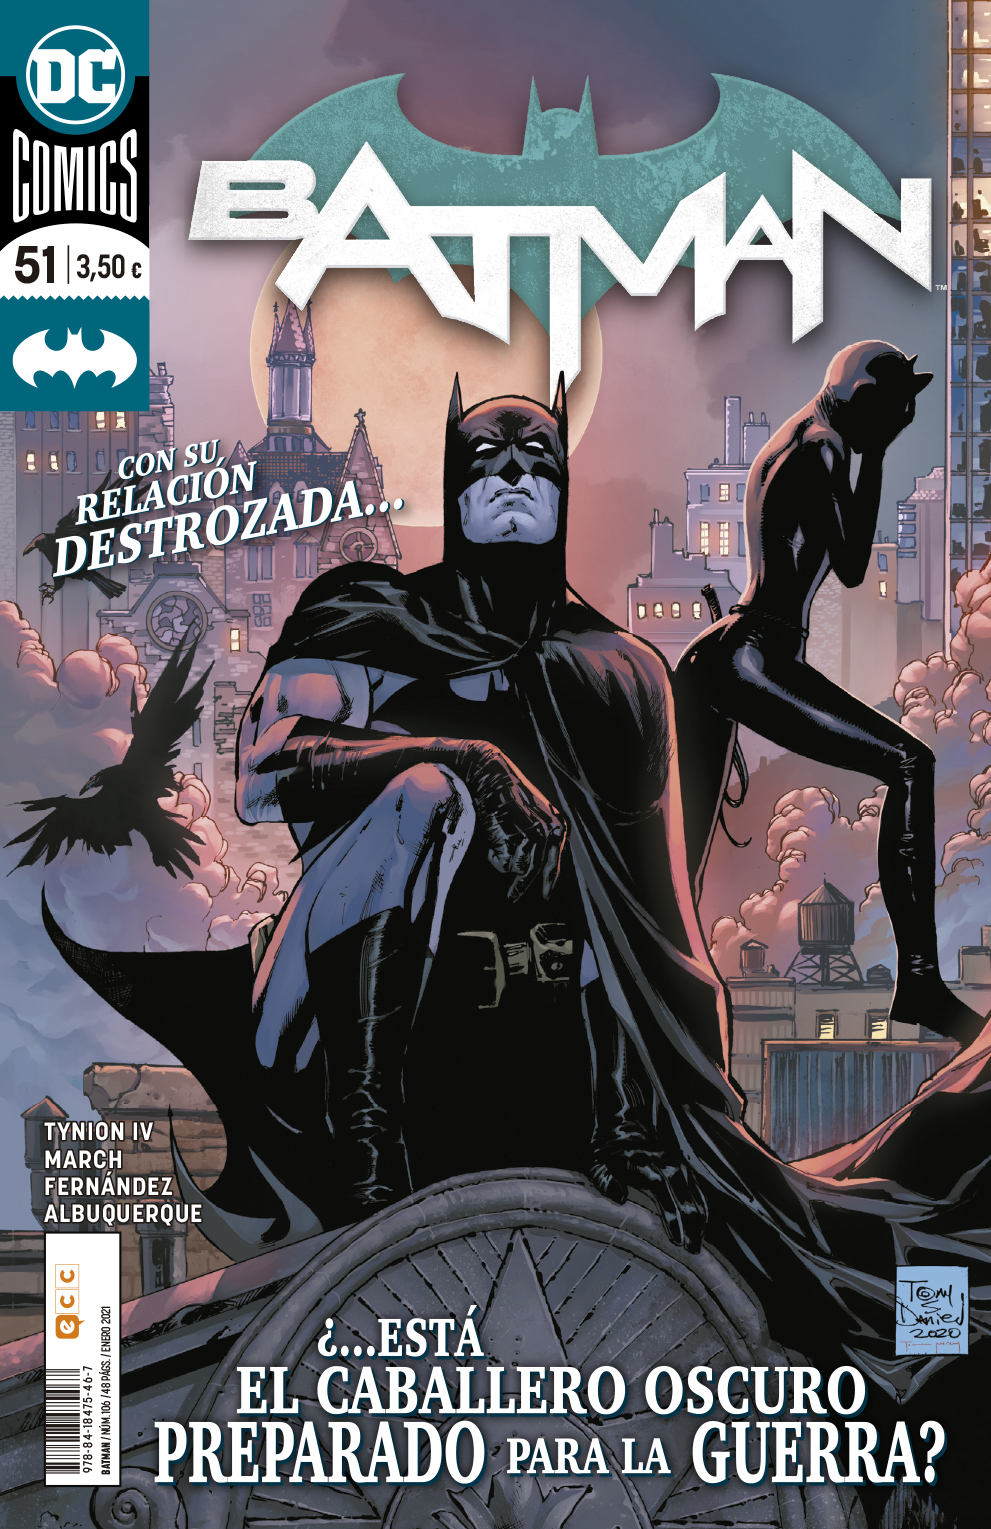 Batman #106 / 51